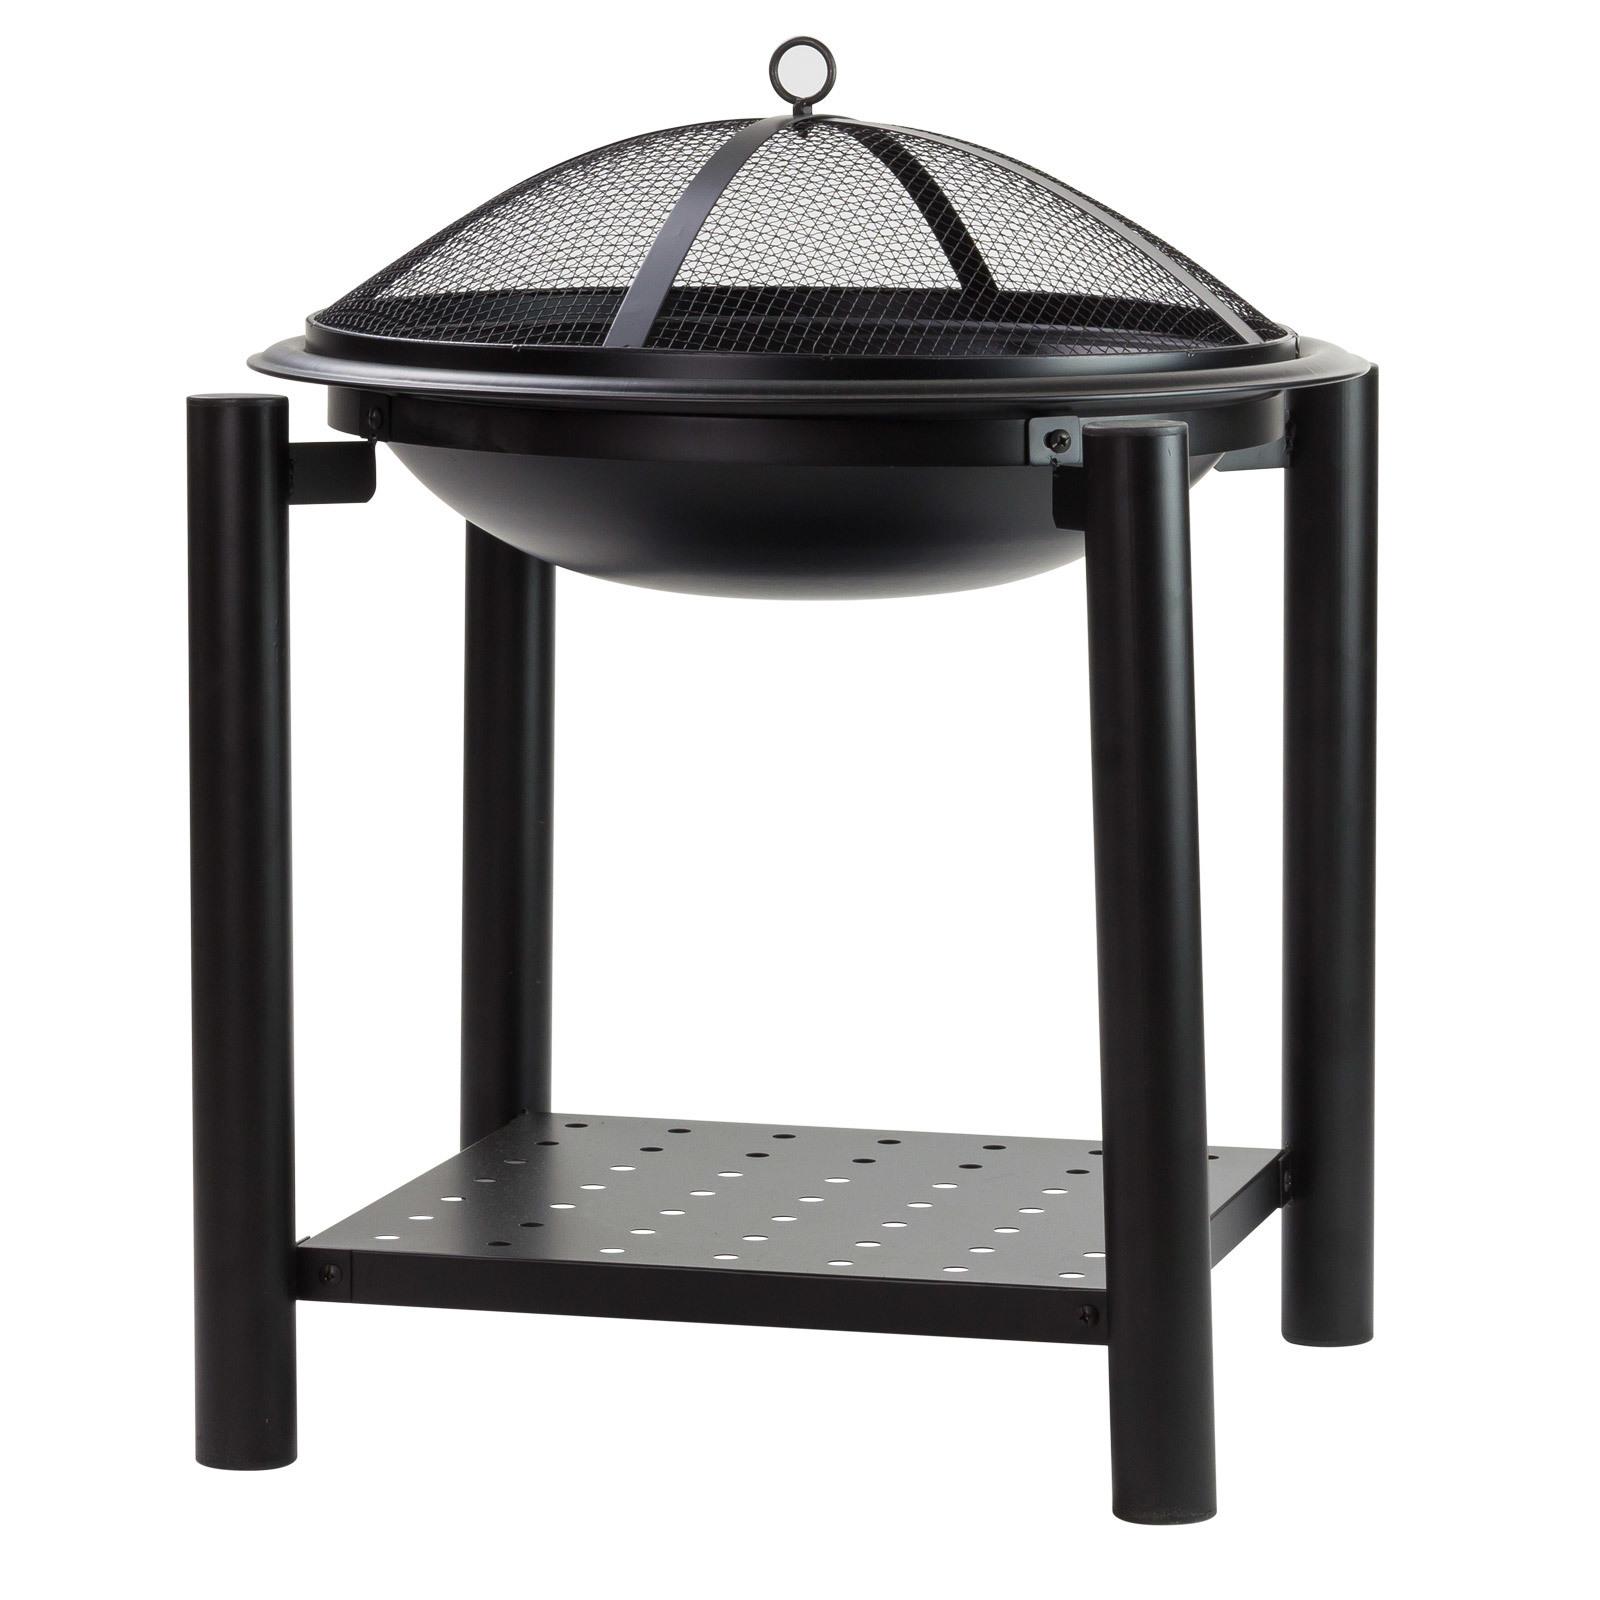 feuerschale feuerkorb feuerstelle gartenfeuer lagerfeuer. Black Bedroom Furniture Sets. Home Design Ideas